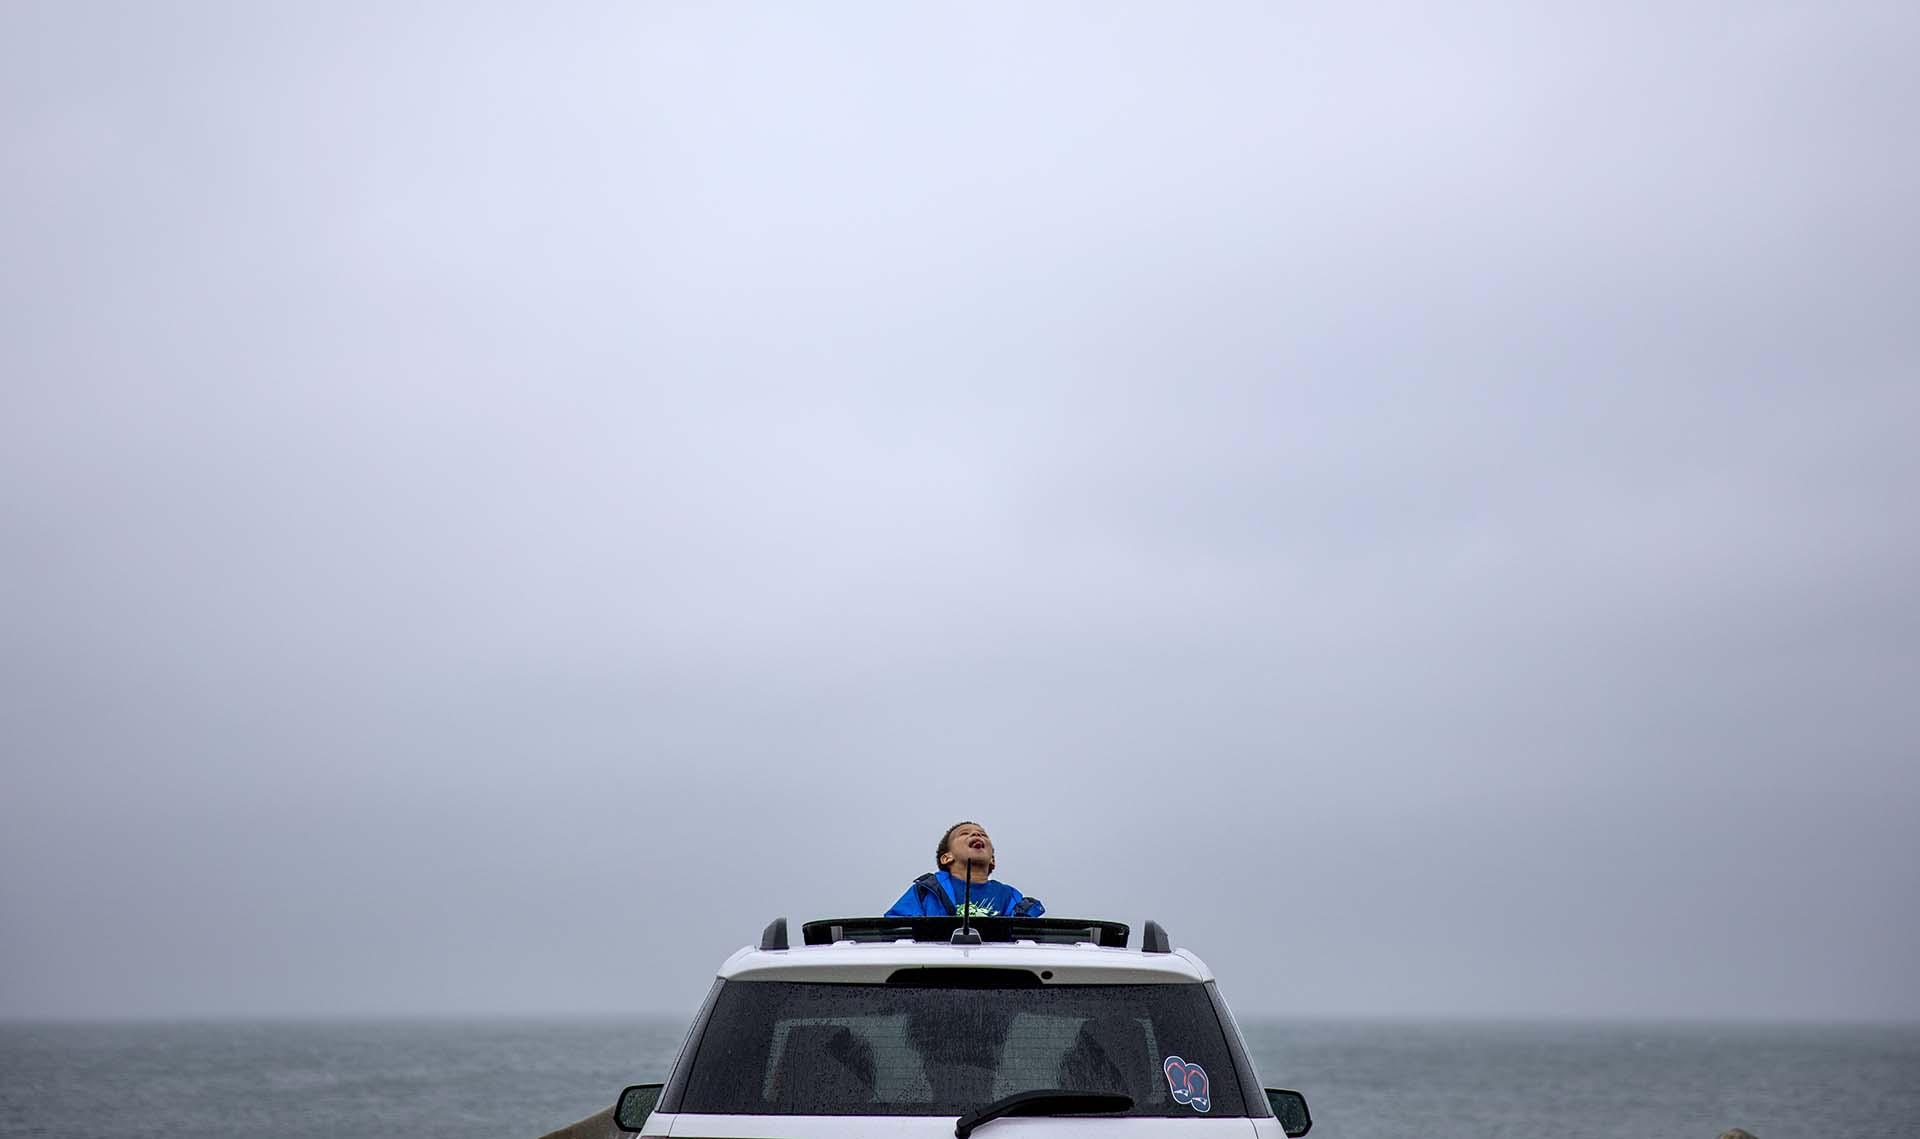 Mason Lambert, de 5 años, mira al cielo mientras la lluvia cae en Narragansett, Rhode Island (AP Photo/David Goldman)